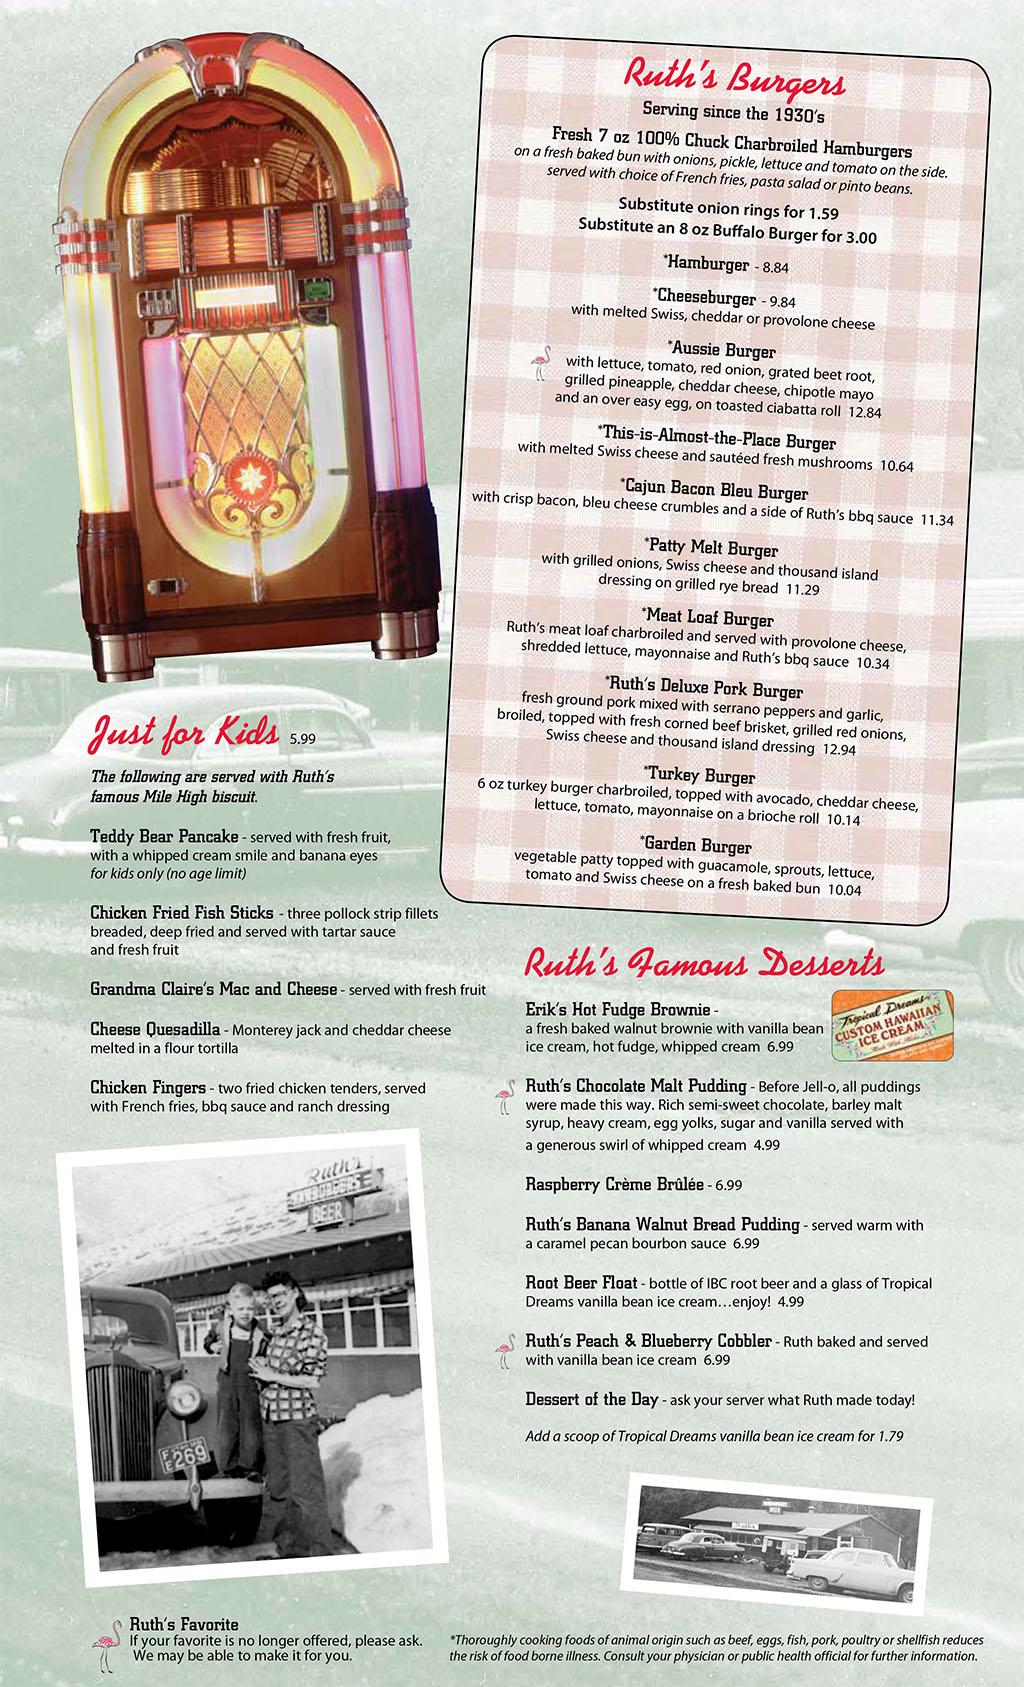 Ruths Diner menu - burgers, kids, desserts